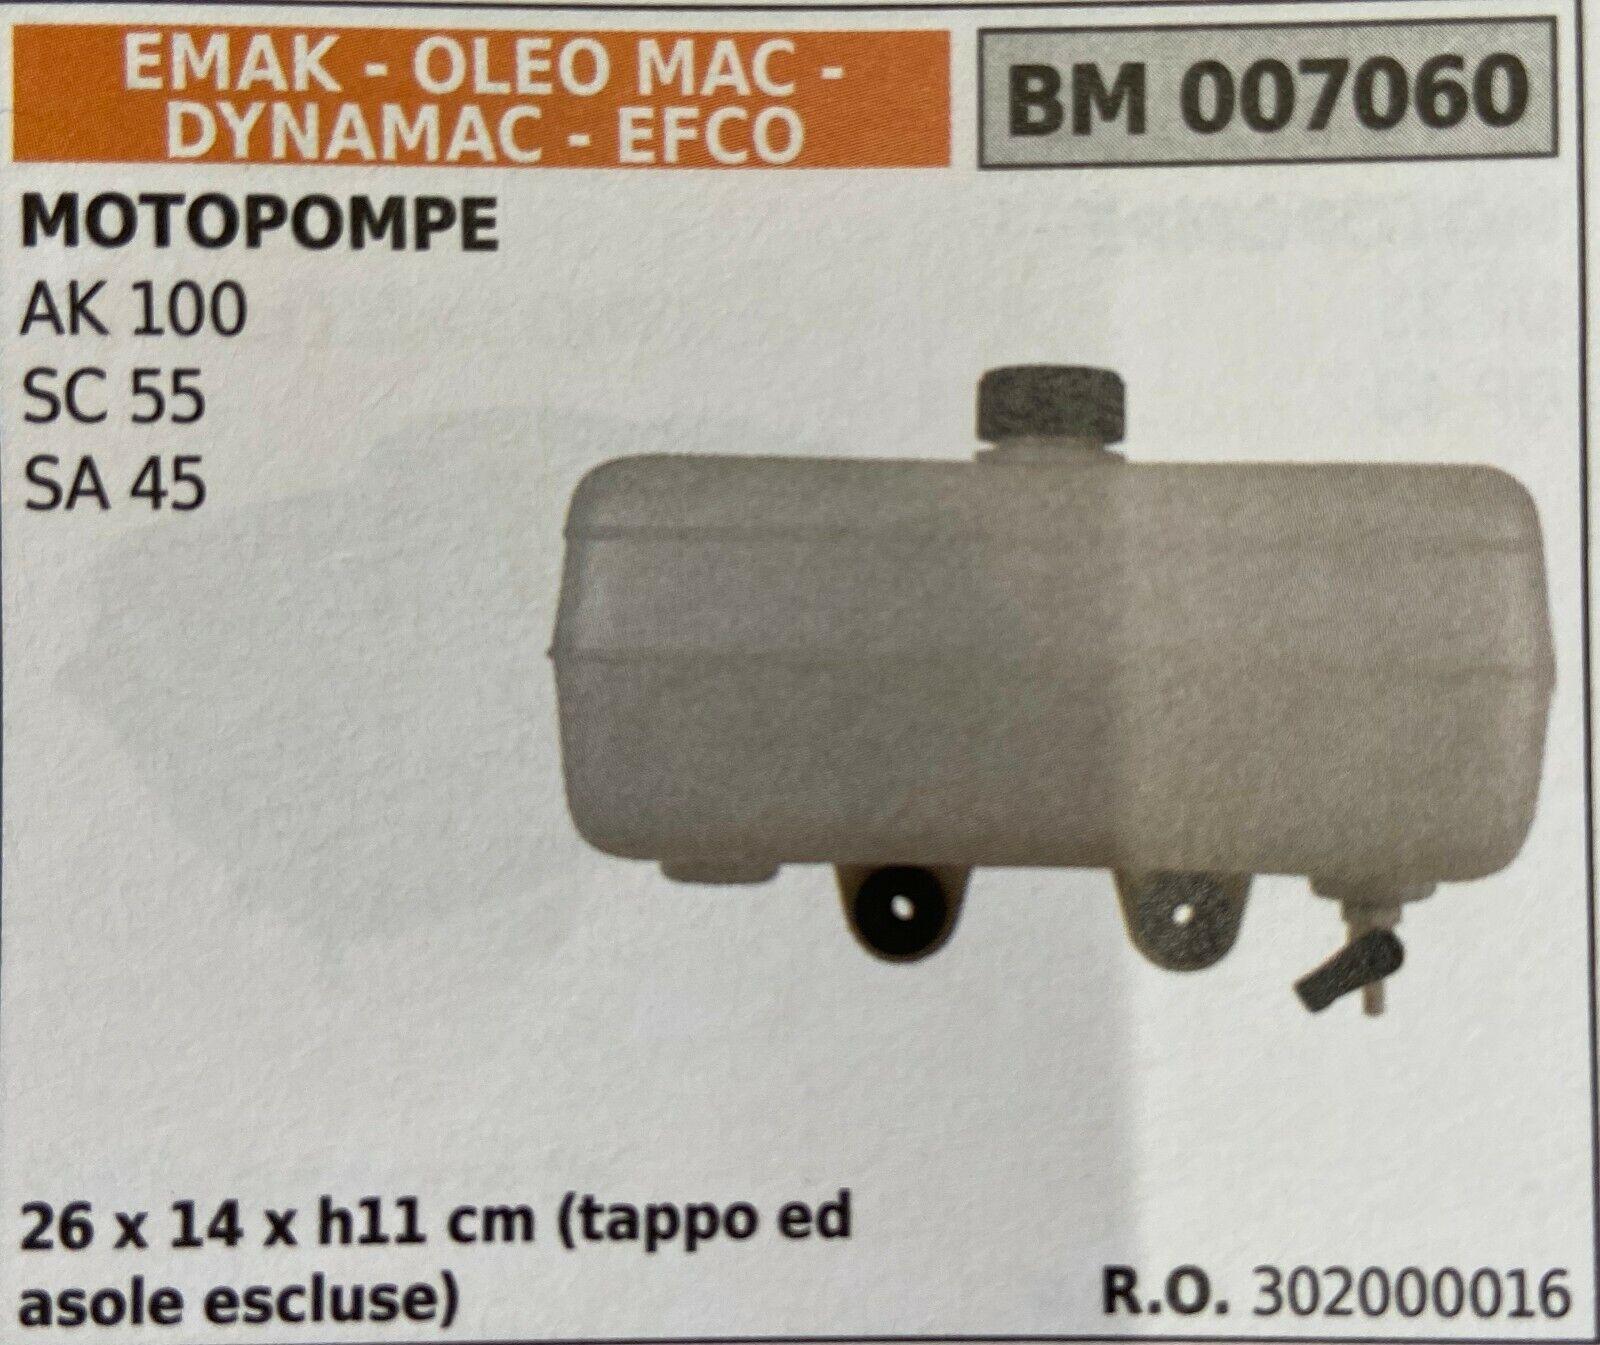 Brumar Tank Emak-Oleo Mac-Dynamac-Efco BM007060